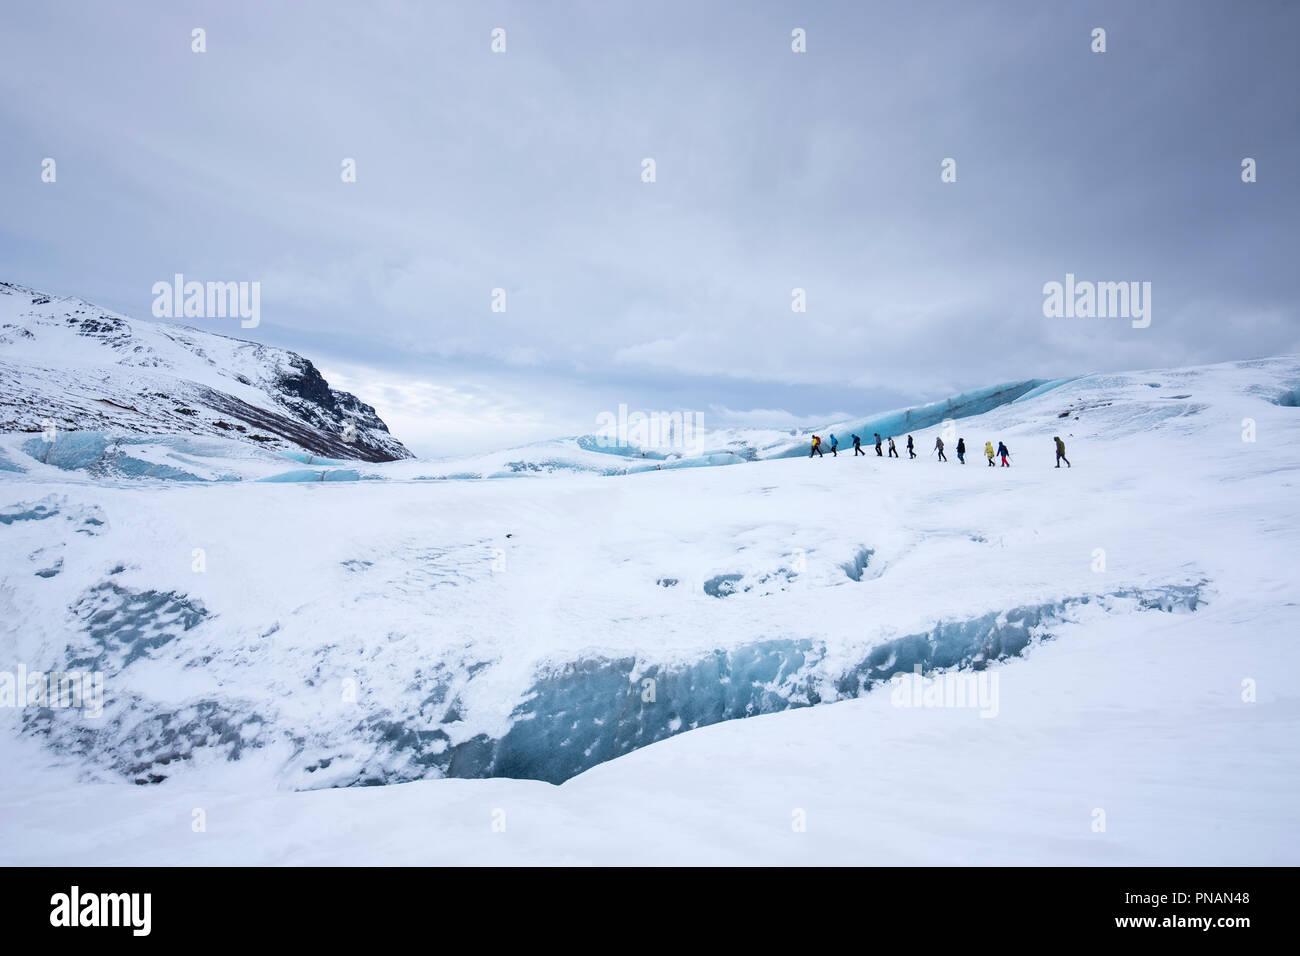 Tourists wearing protective clothing for glacier hike on Svinafellsjokull glacier an outlet glacier of Vatnajokull, South Iceland Stock Photo